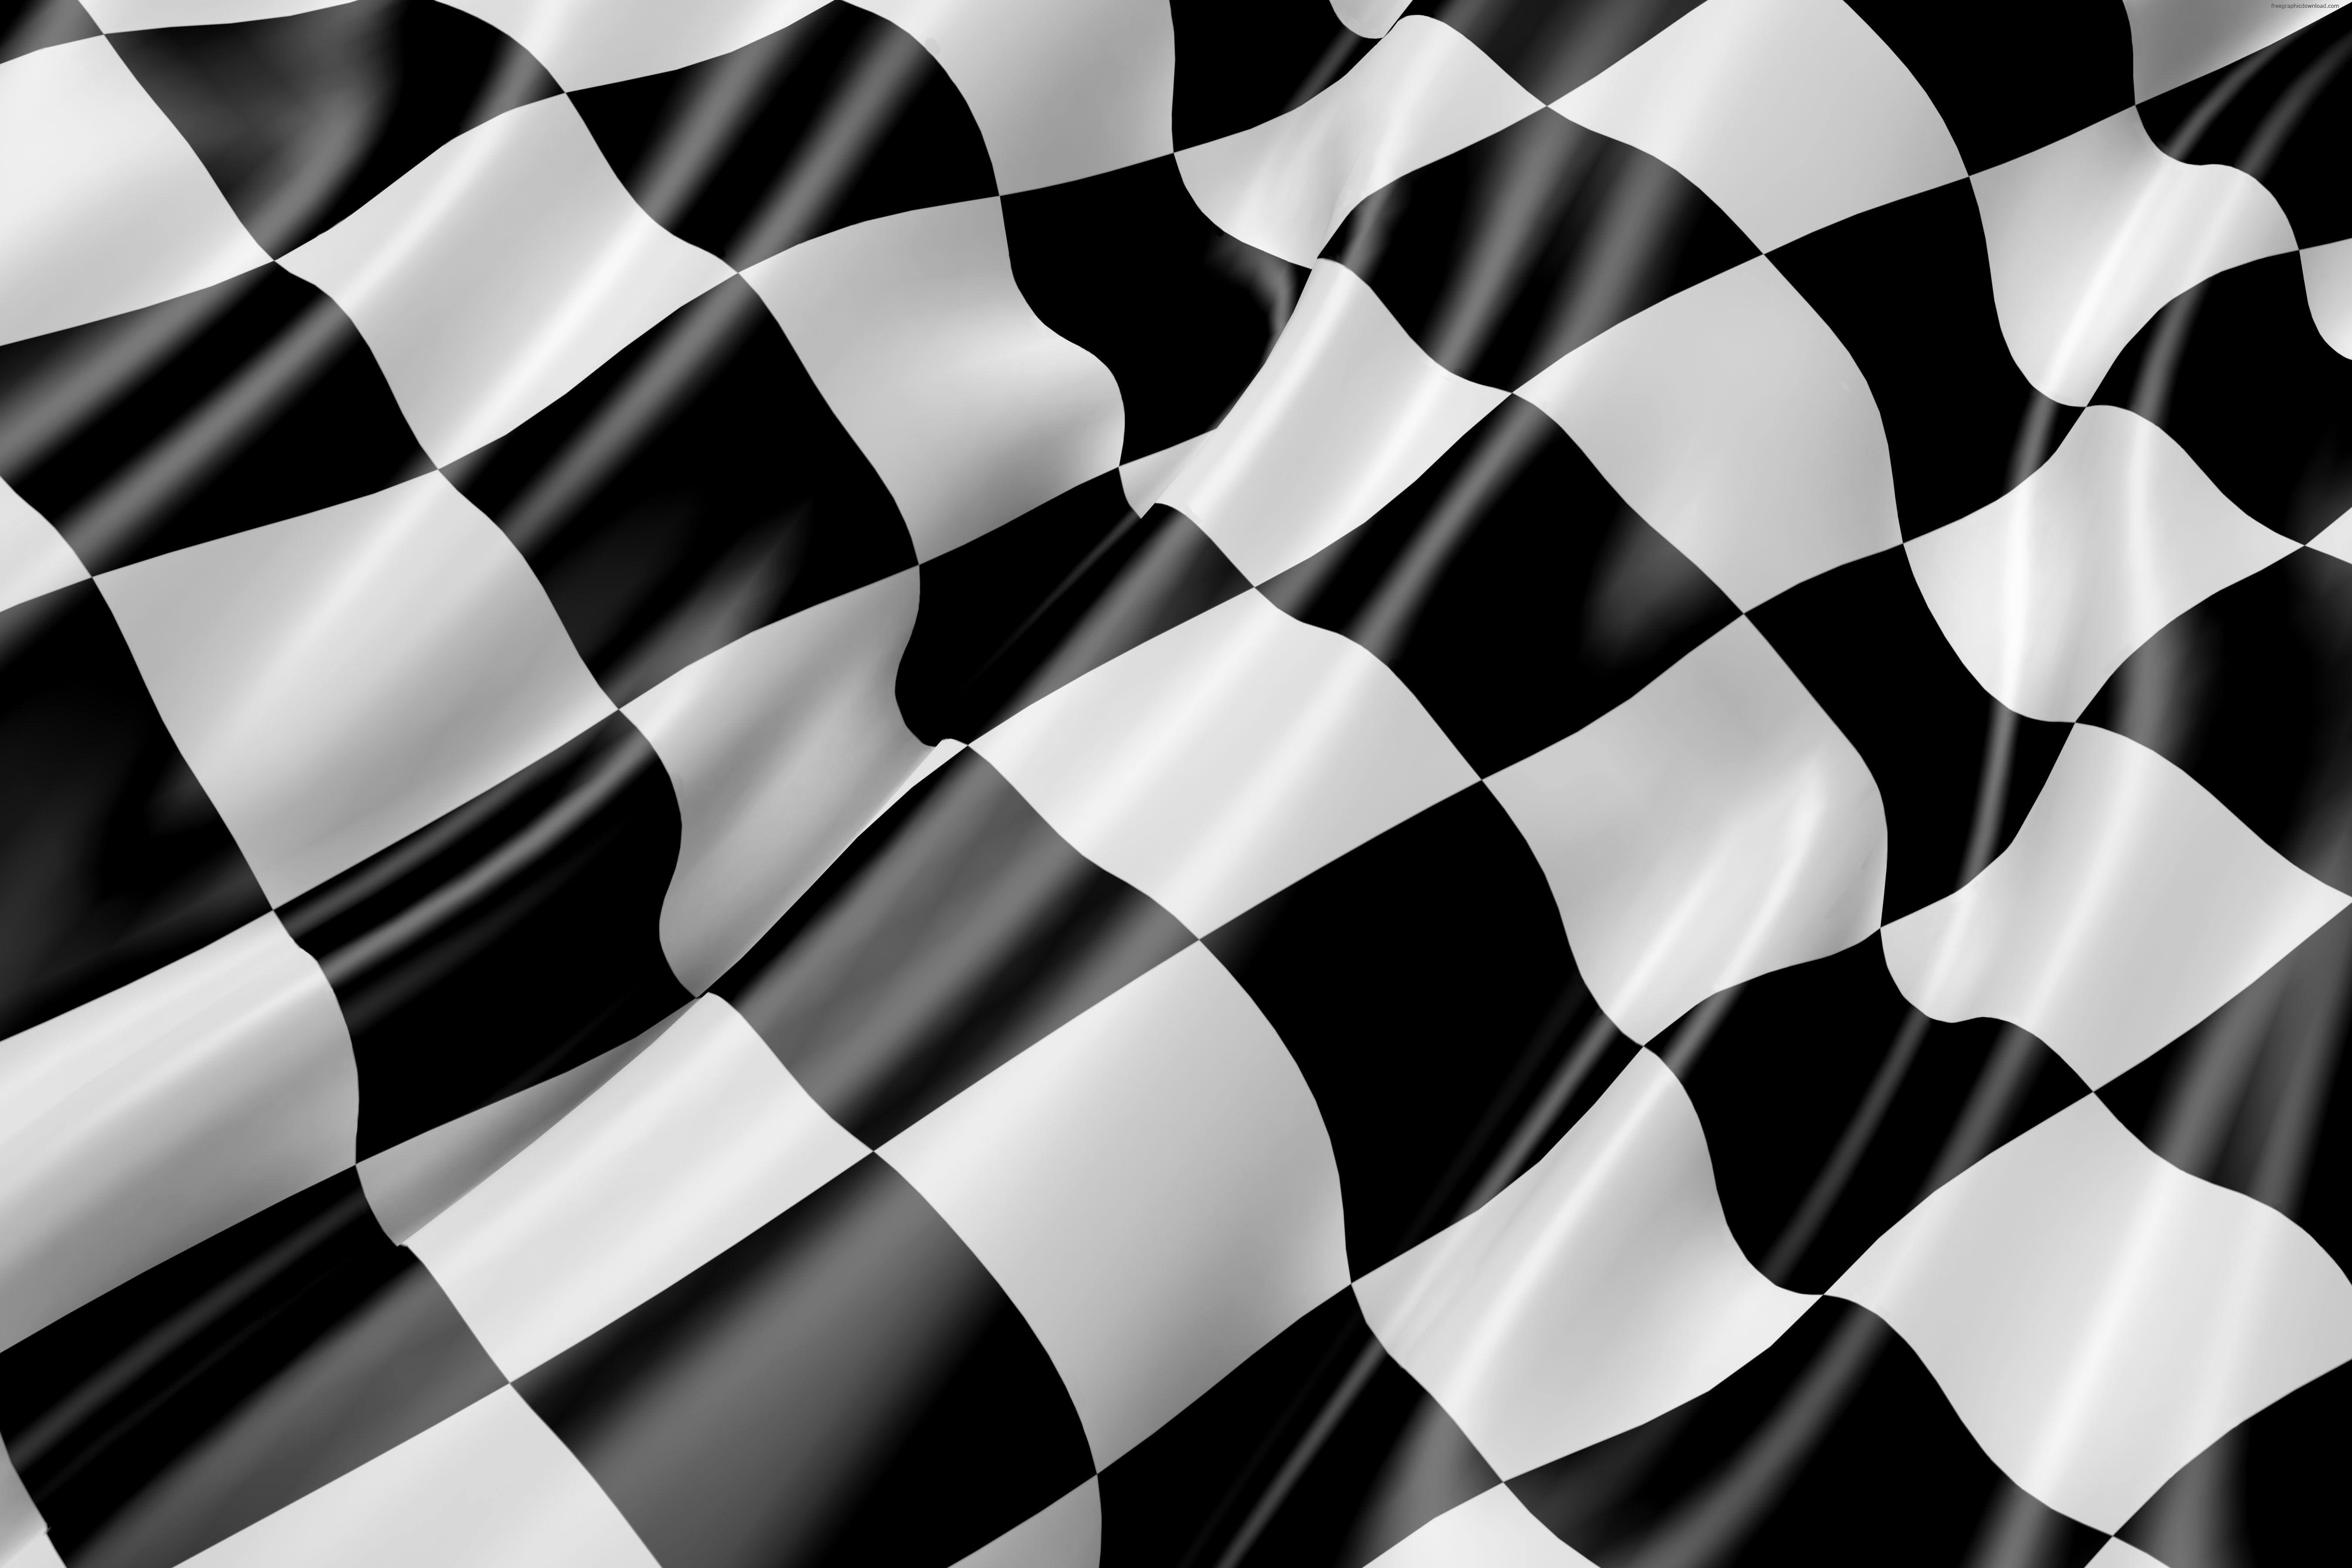 Racing Flag Wallpapers   Top Racing Flag Backgrounds 5400x3600